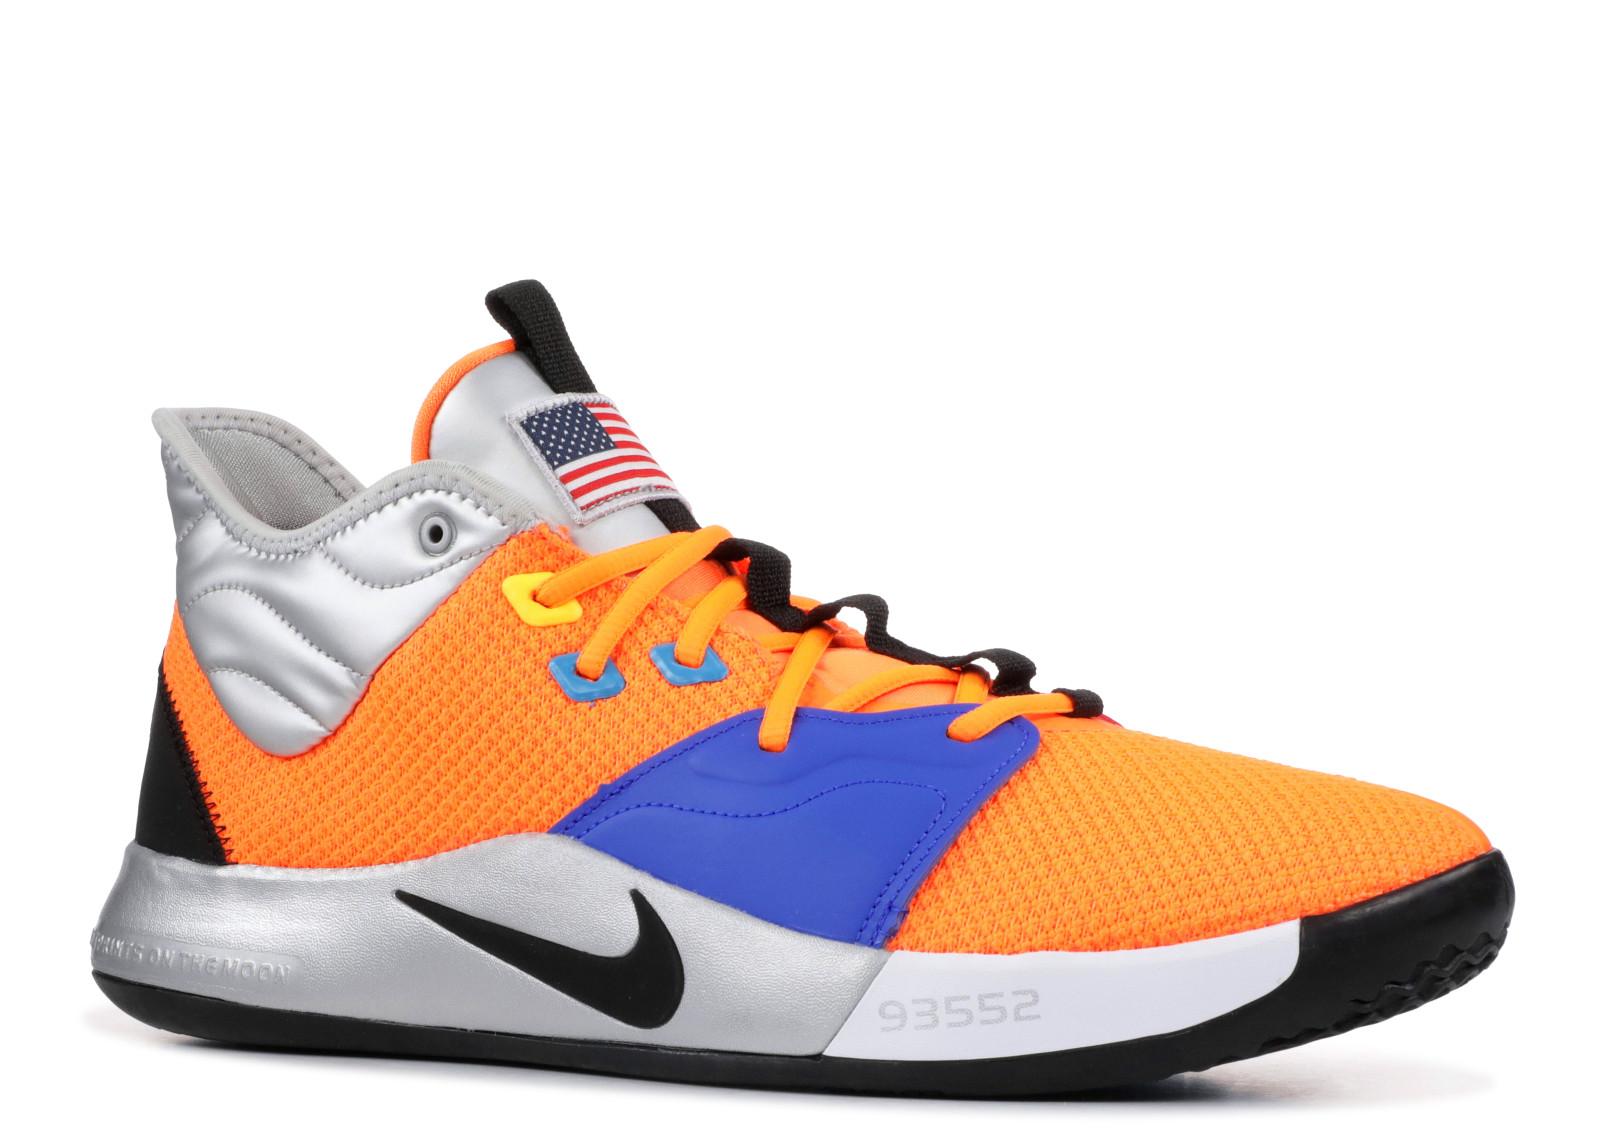 beb2c3833264 Kick Avenue - Authentic Sneakers